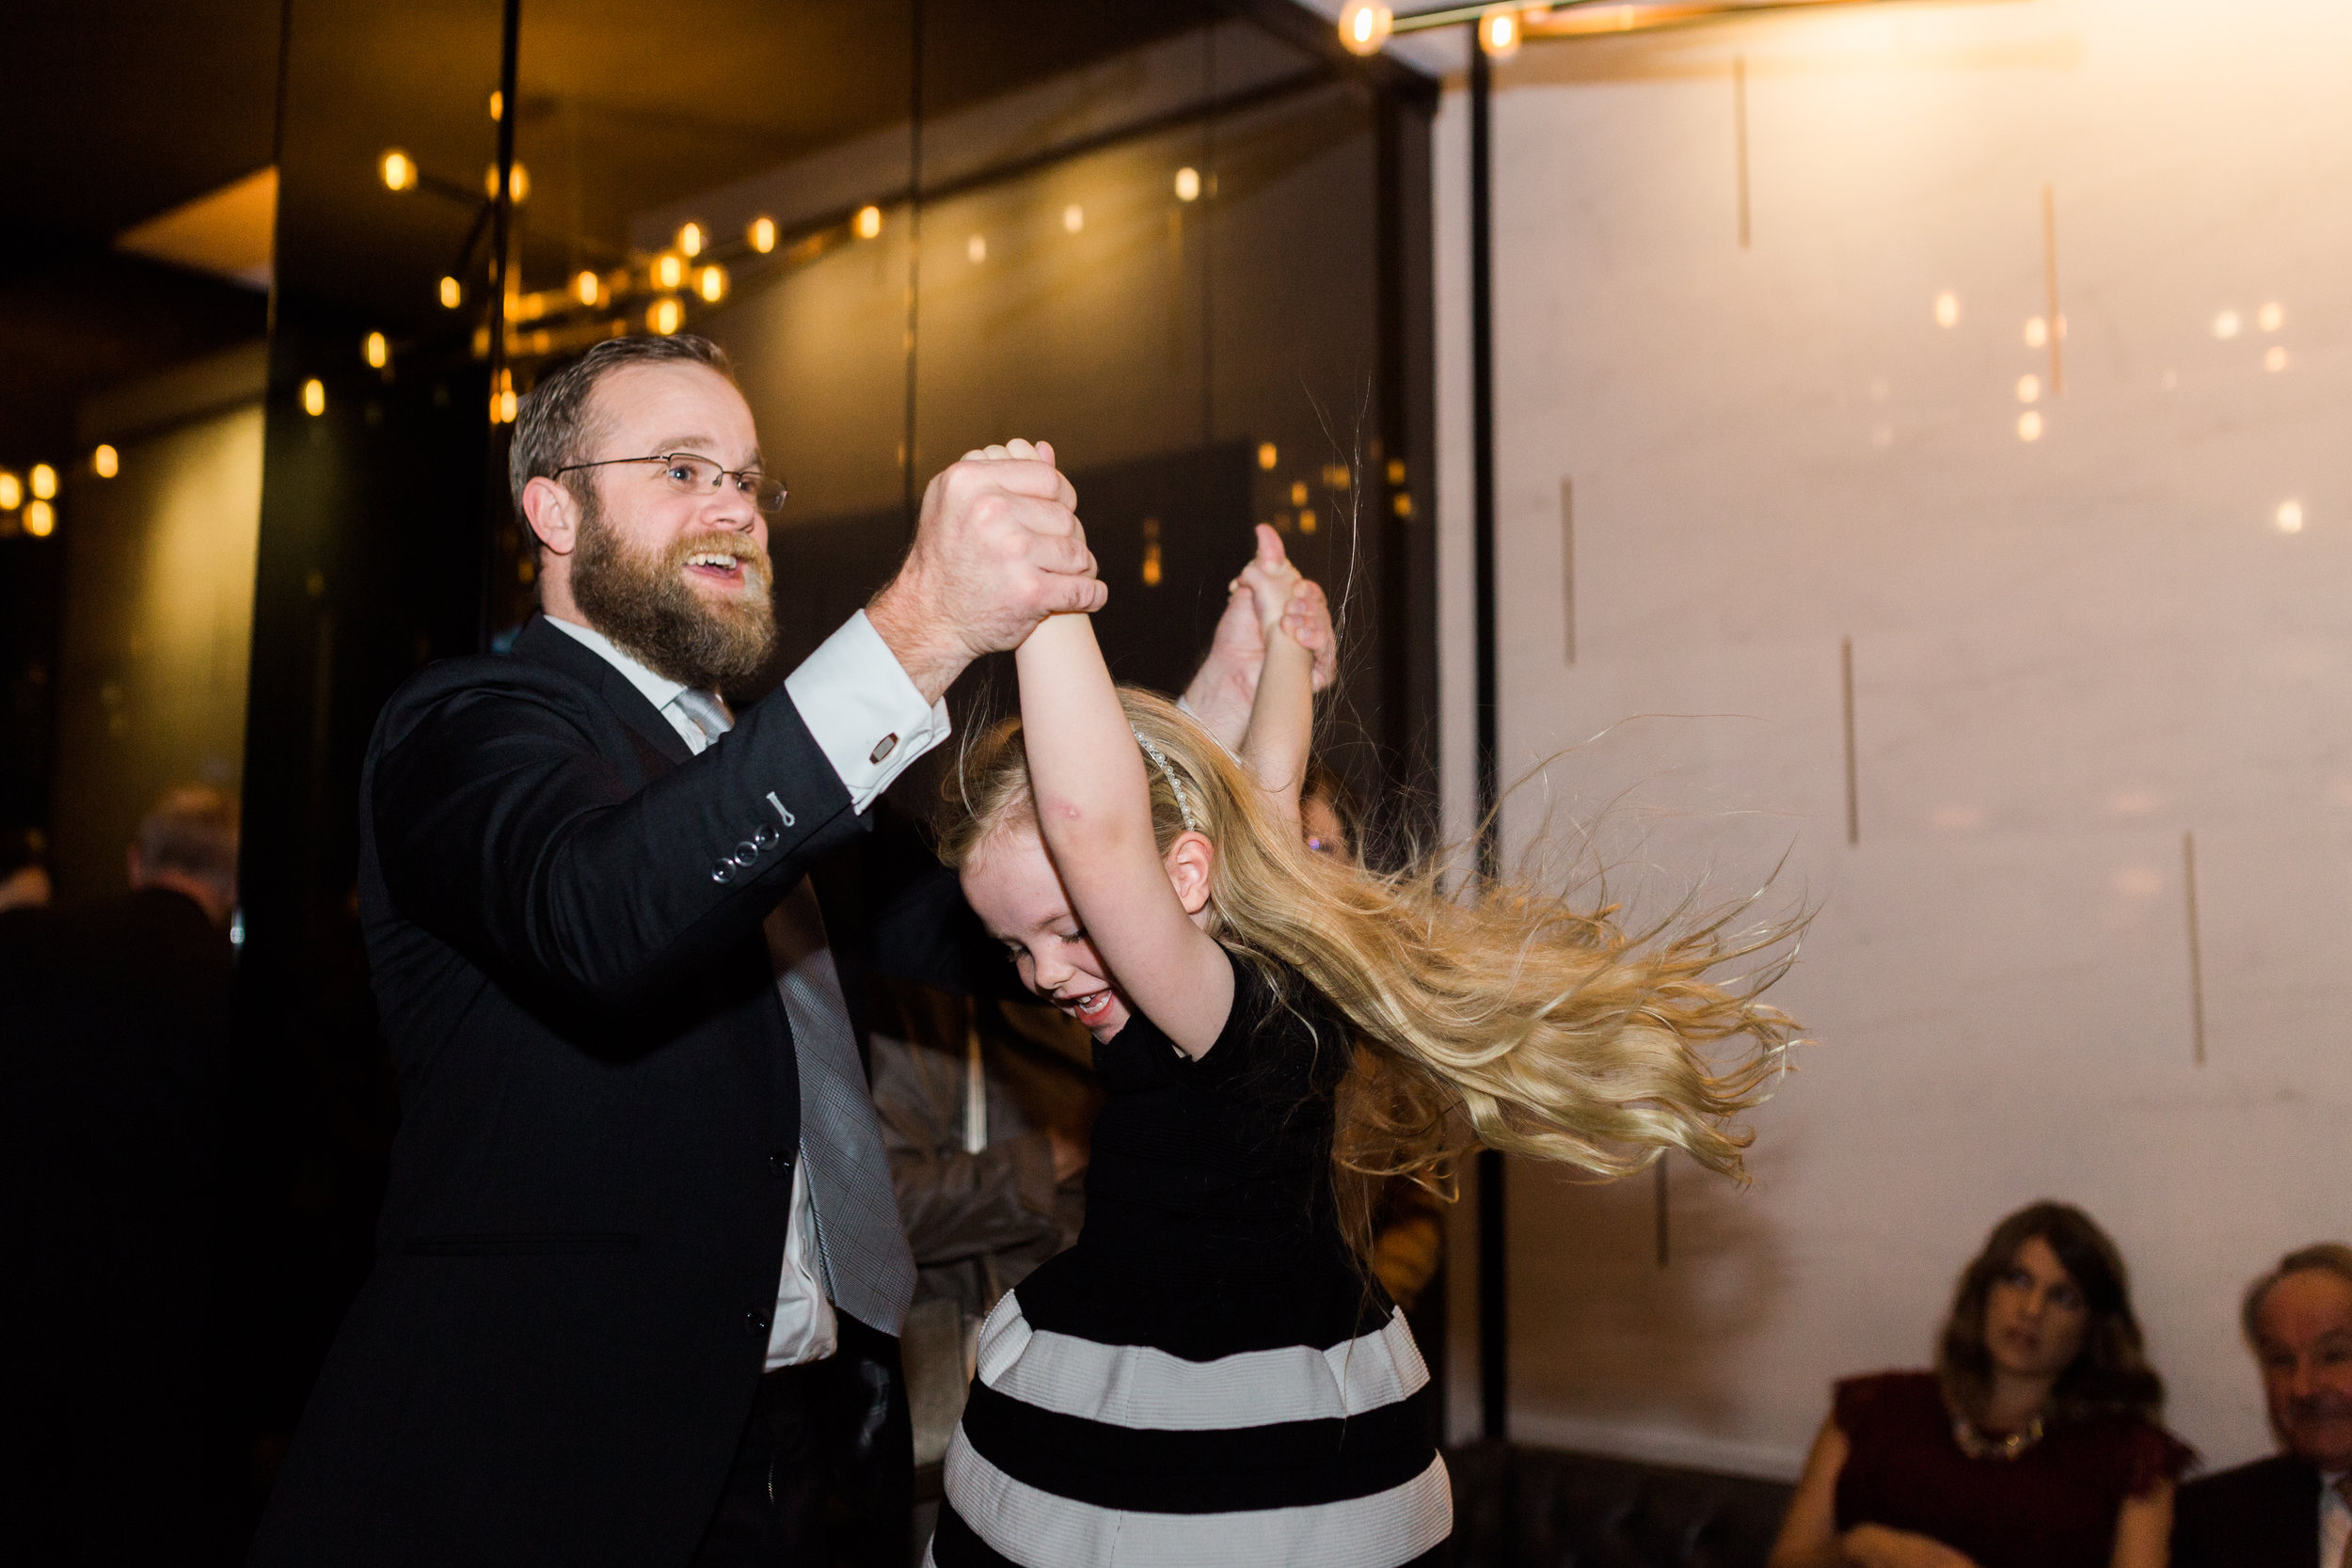 Toronto Fine Art Photographer - 180 Restaurant Wedding - Ceremony-66.jpg